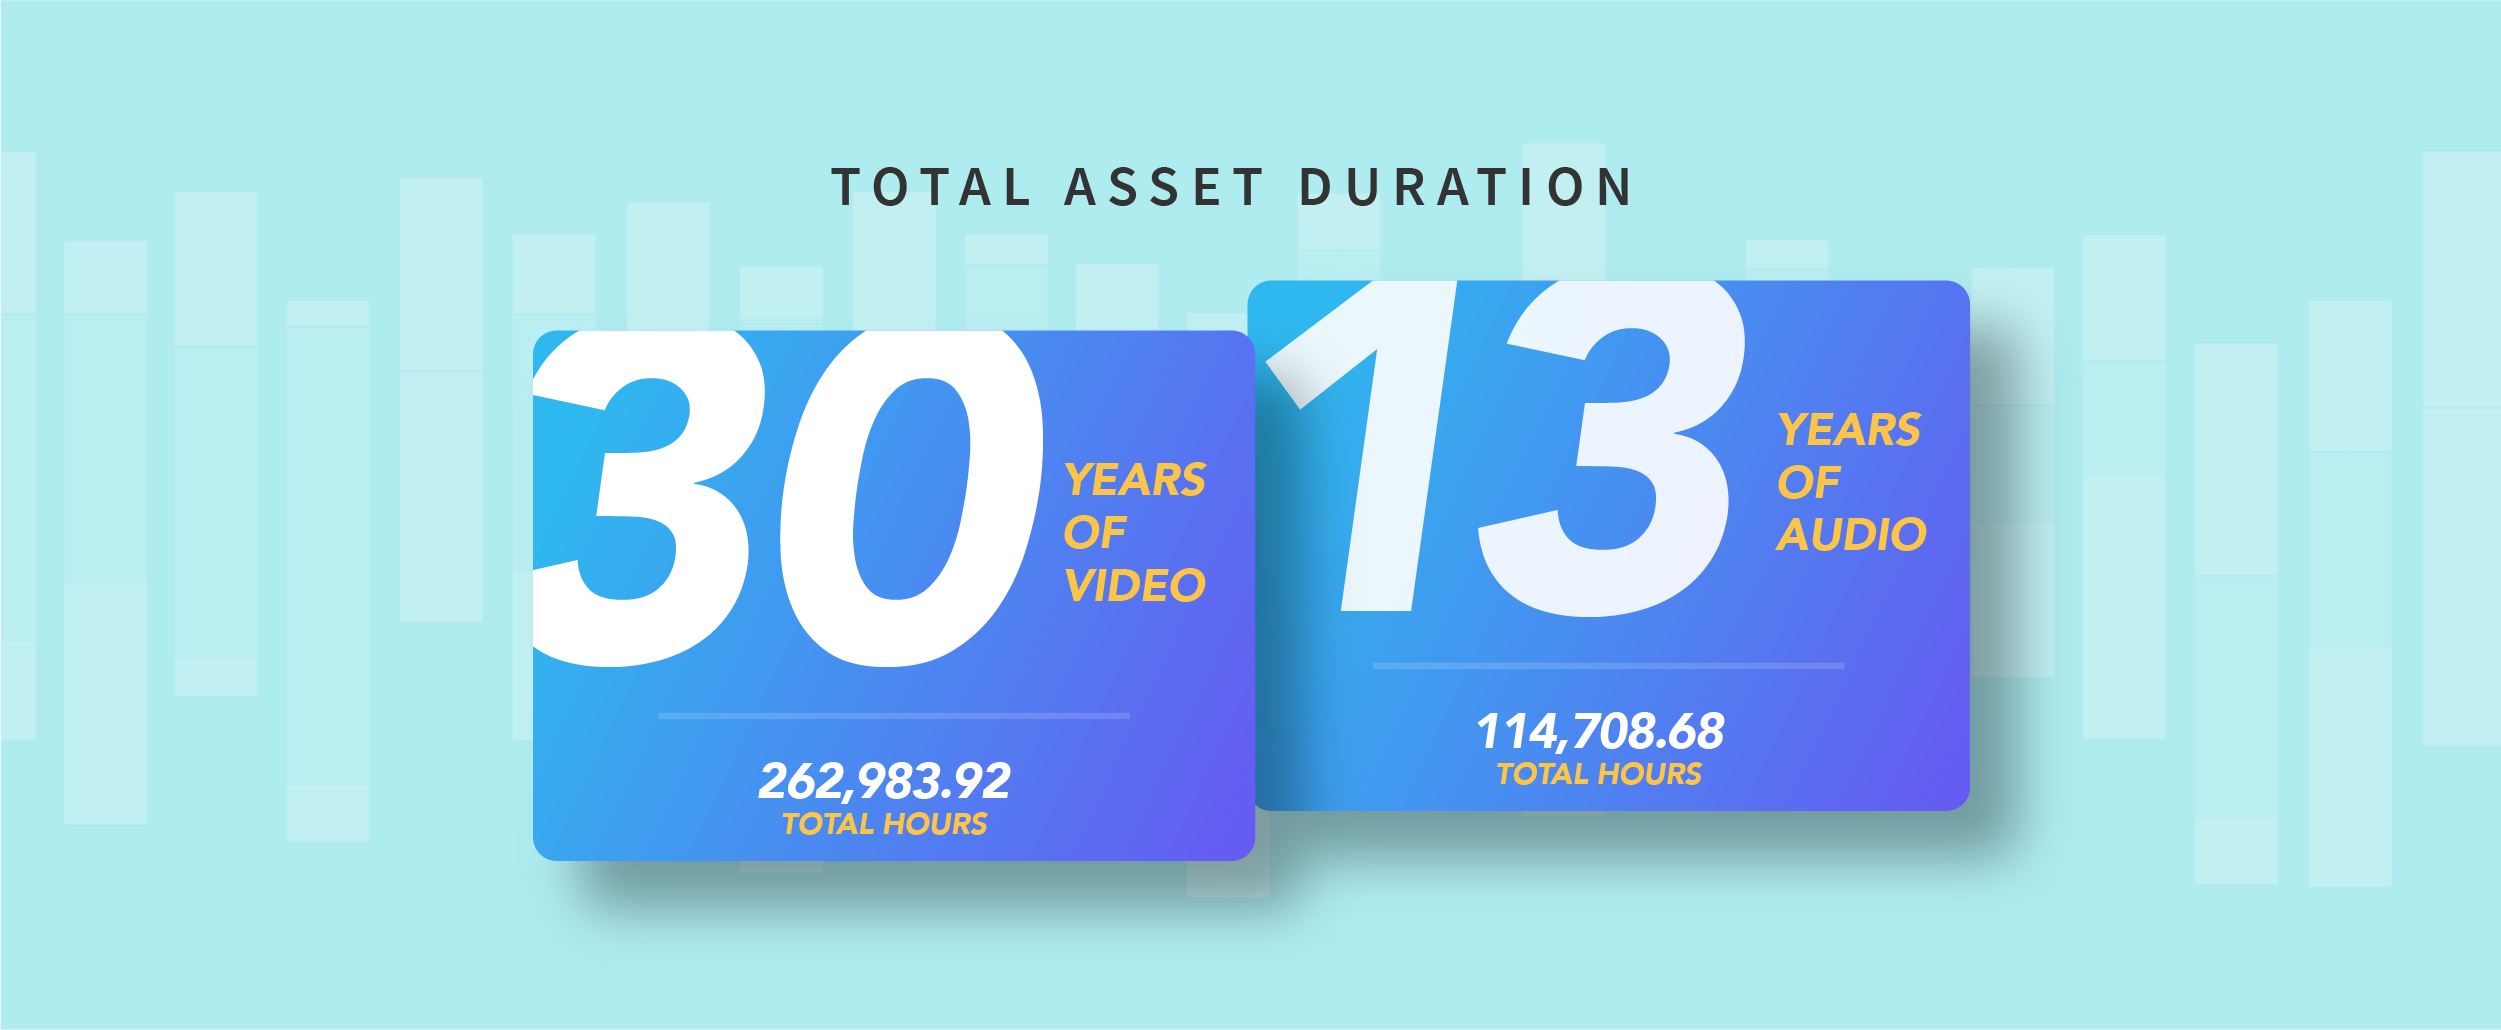 iconik asset durations